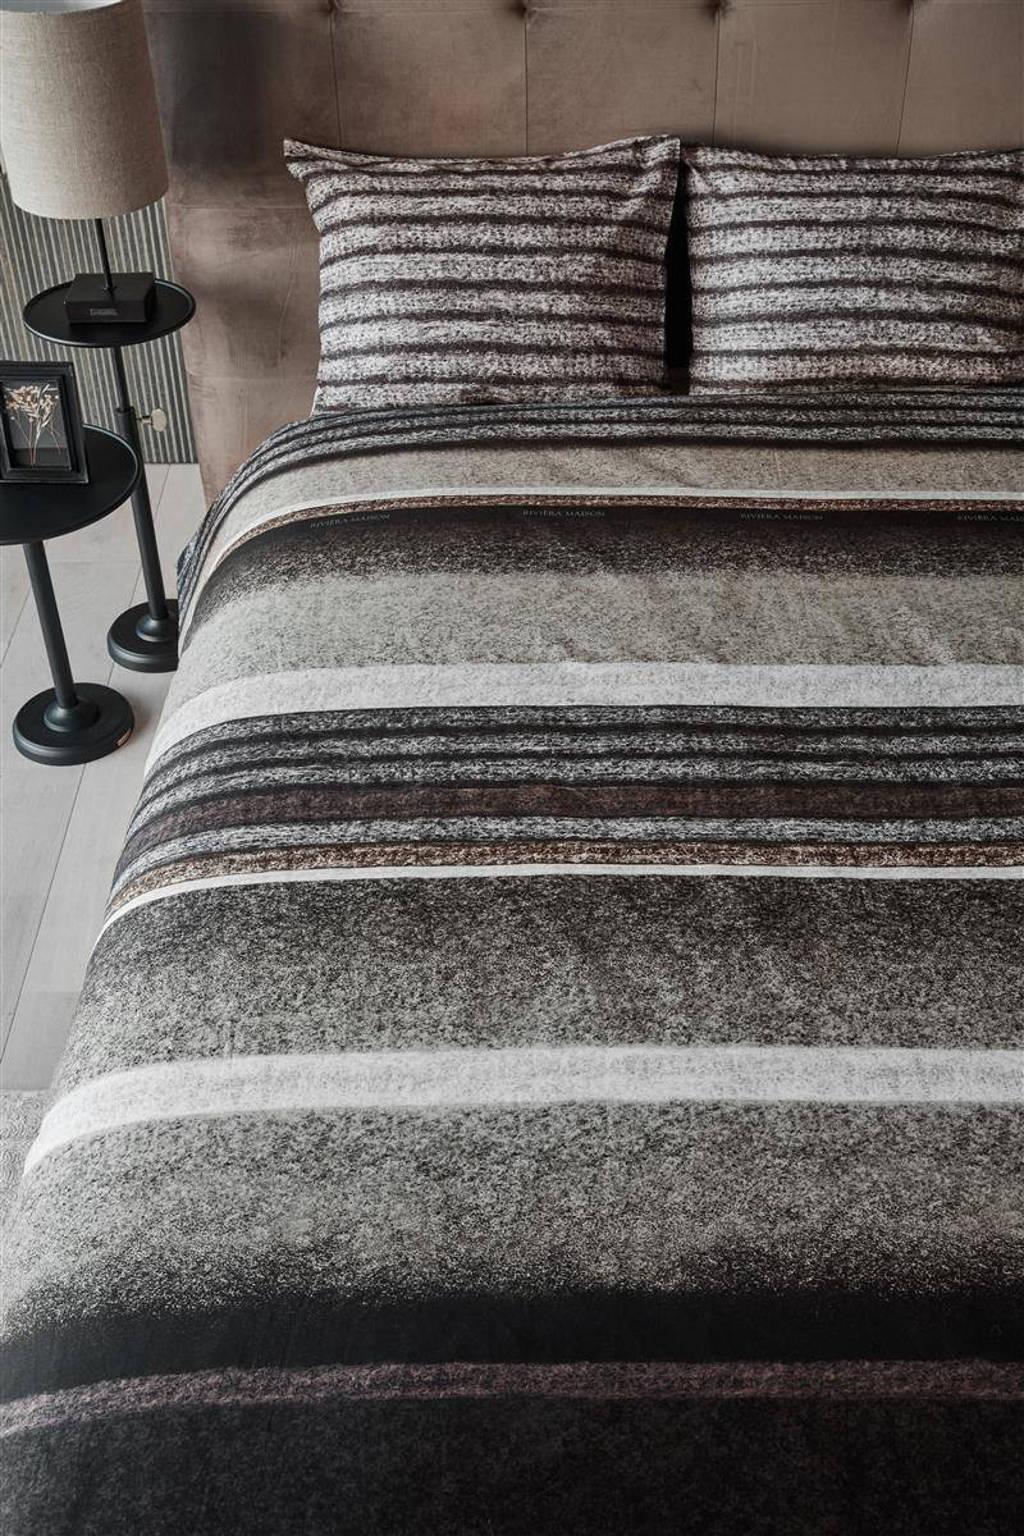 Riviera Maison katoenen dekbedovertrek lits-jumeaux, Lits-jumeaux (240 cm breed), Bruin